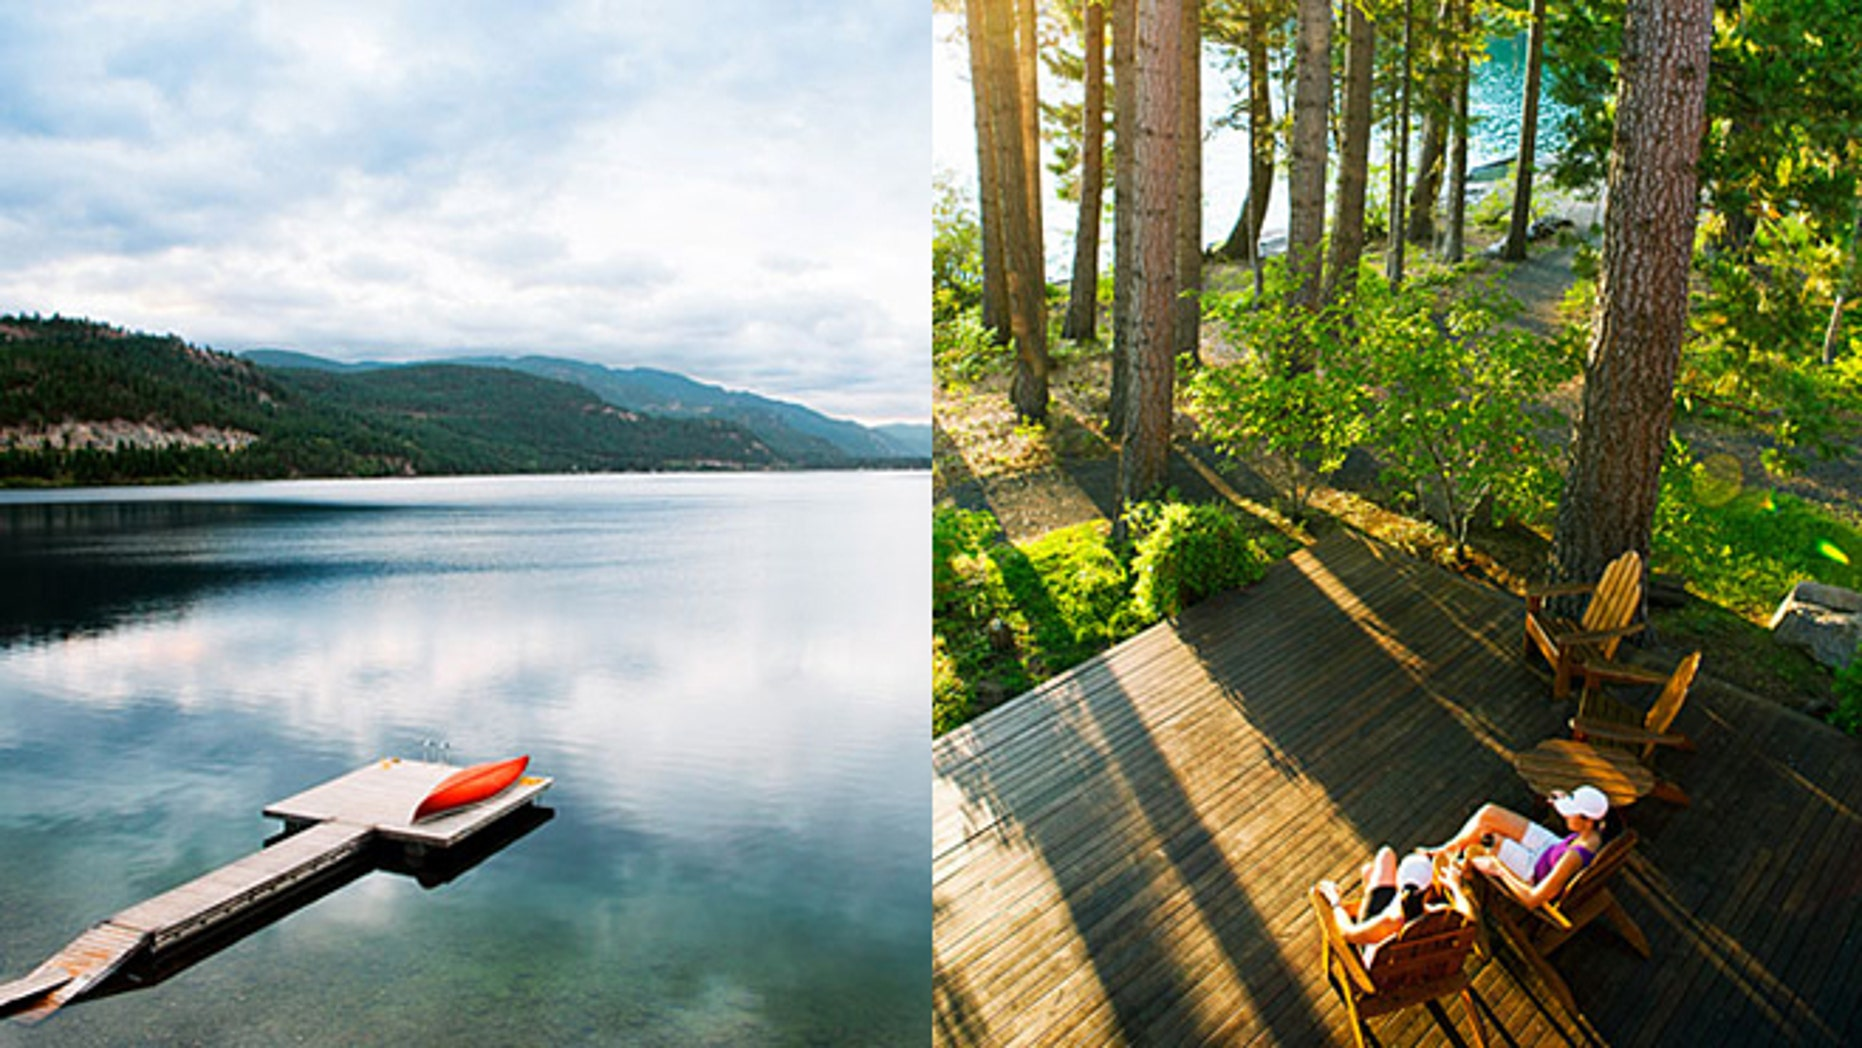 Christina Lake [left] and Suttle Lake